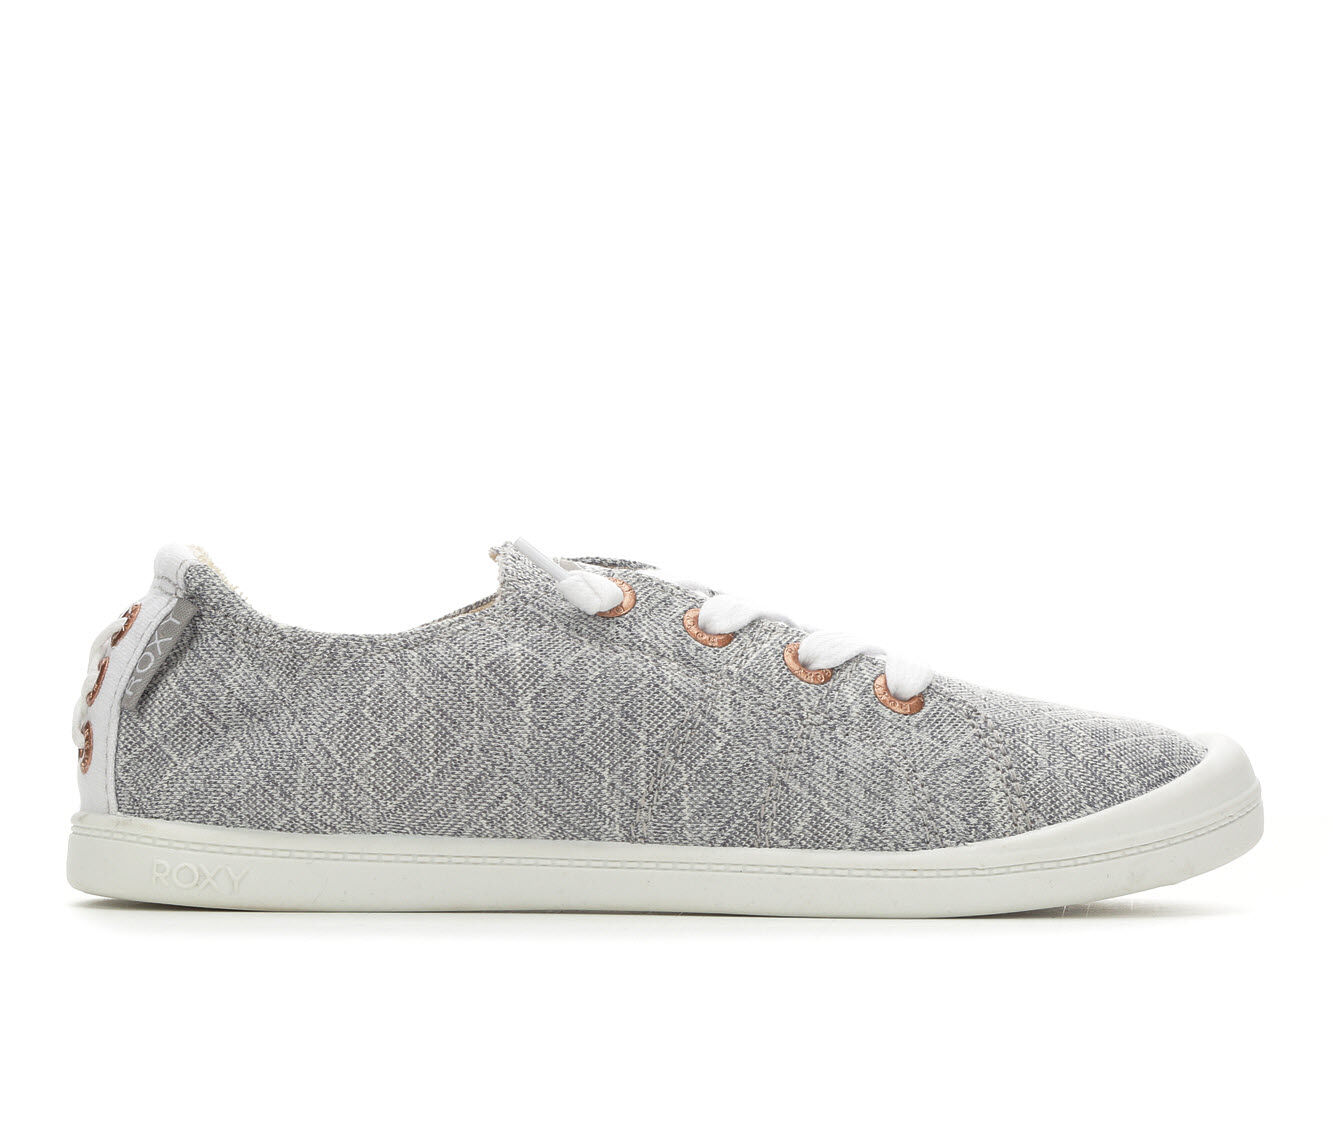 Women's Roxy Bayshore Sneakers Grey Diamond